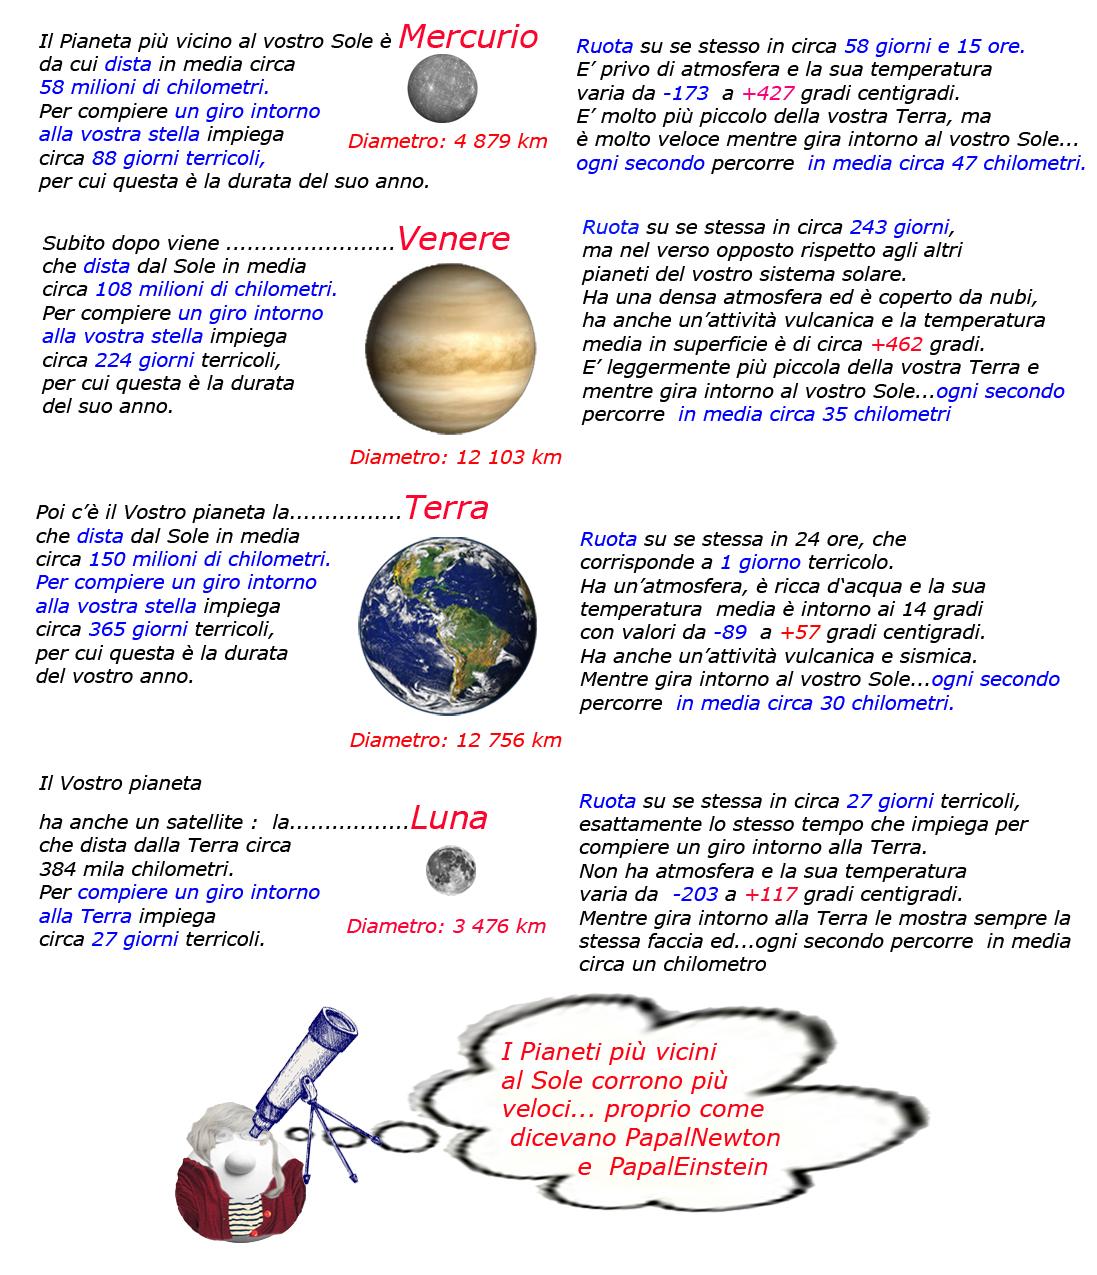 001 Mercurio Venere terra nuovo